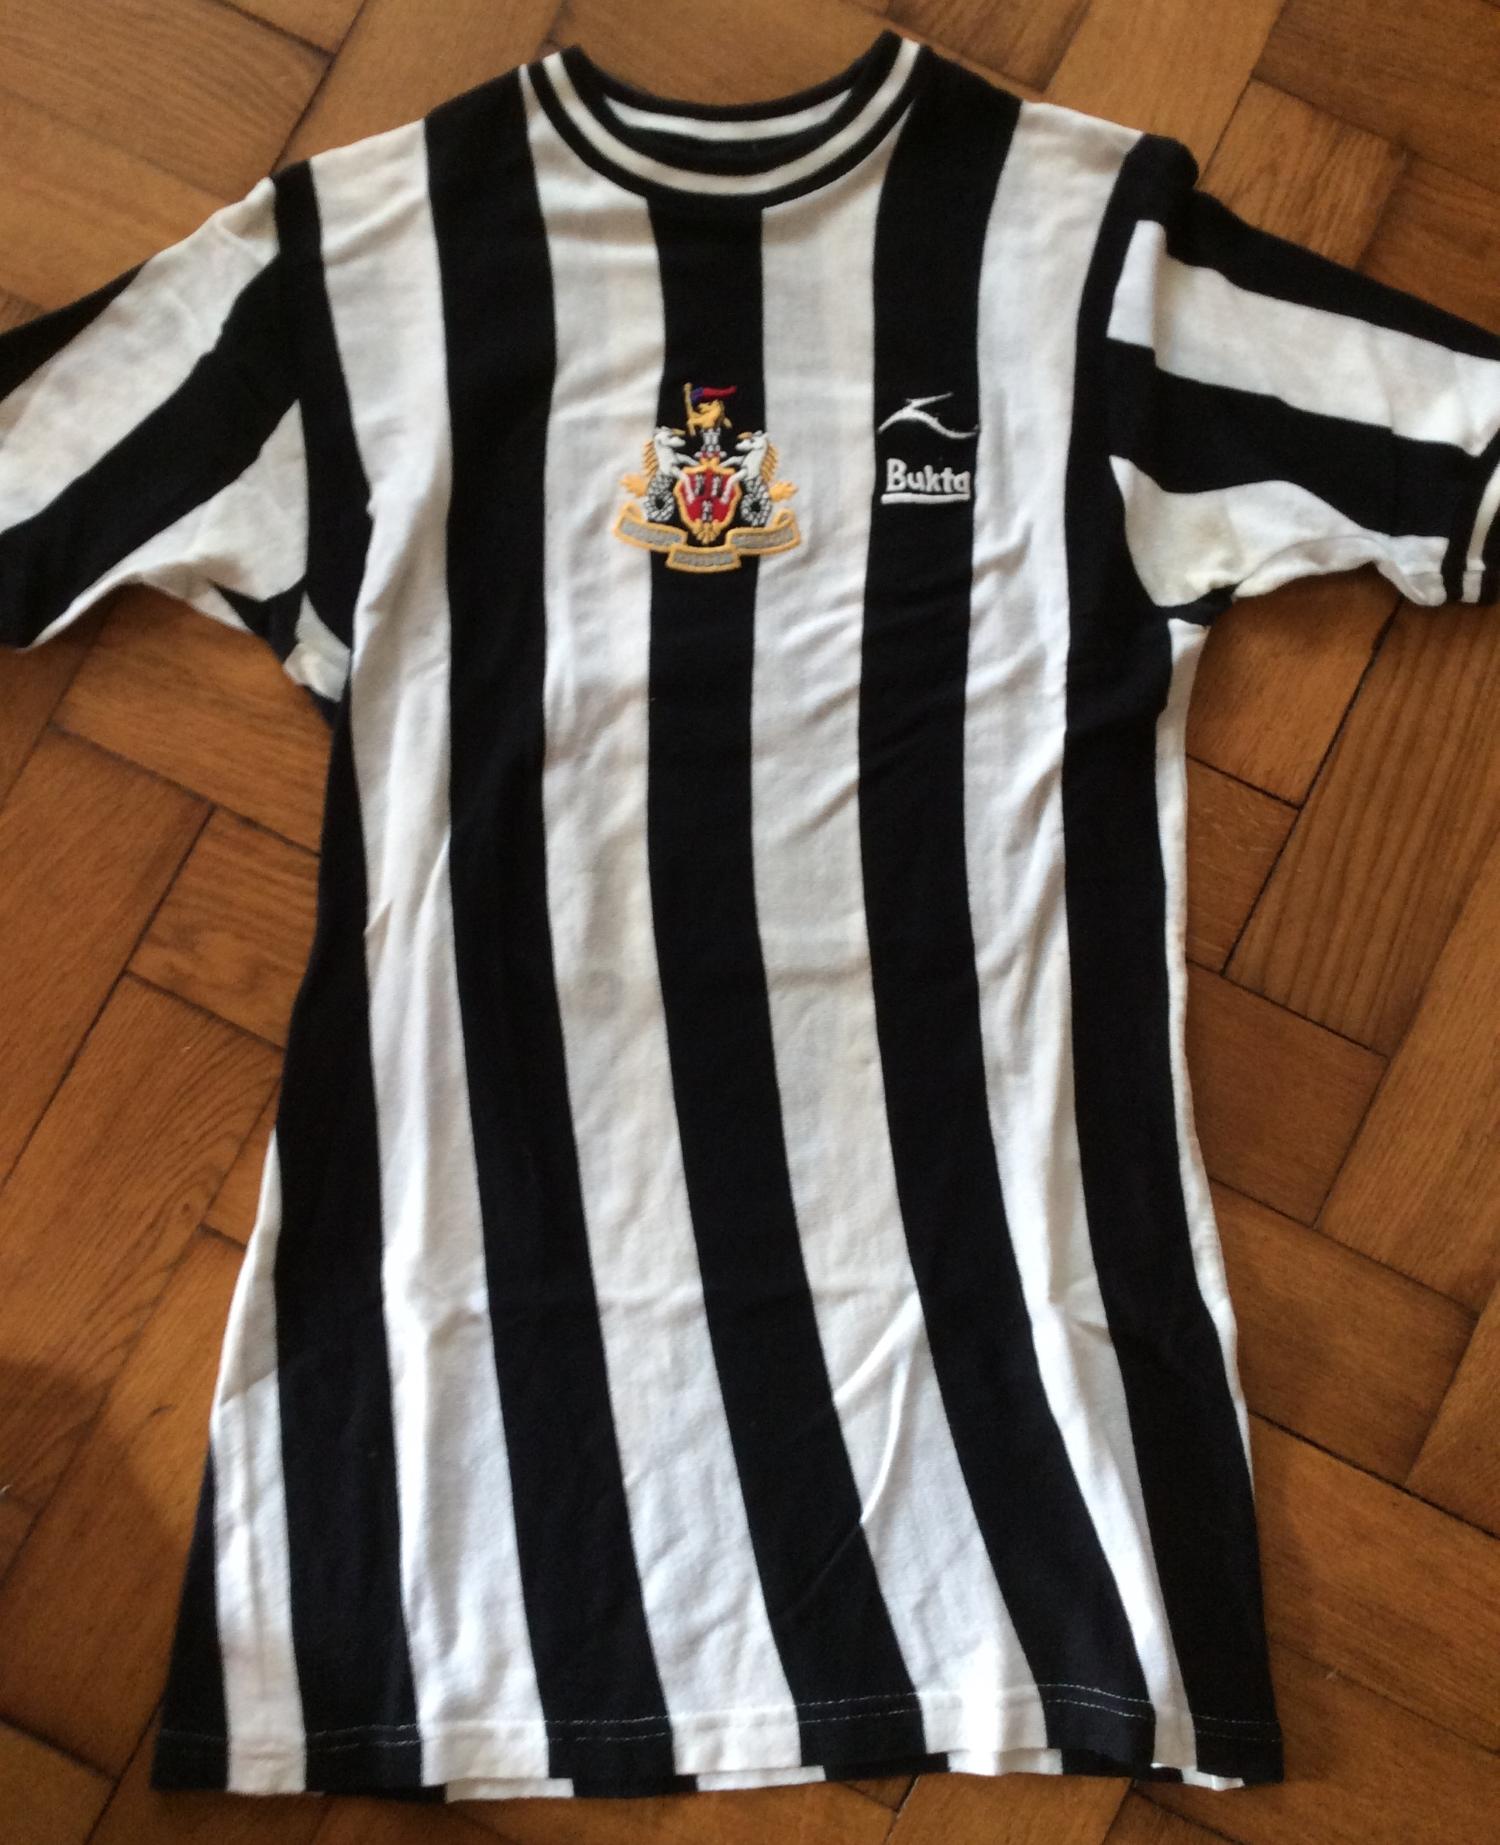 Malcolm Macdonald newcastle united matchworn shirt collector